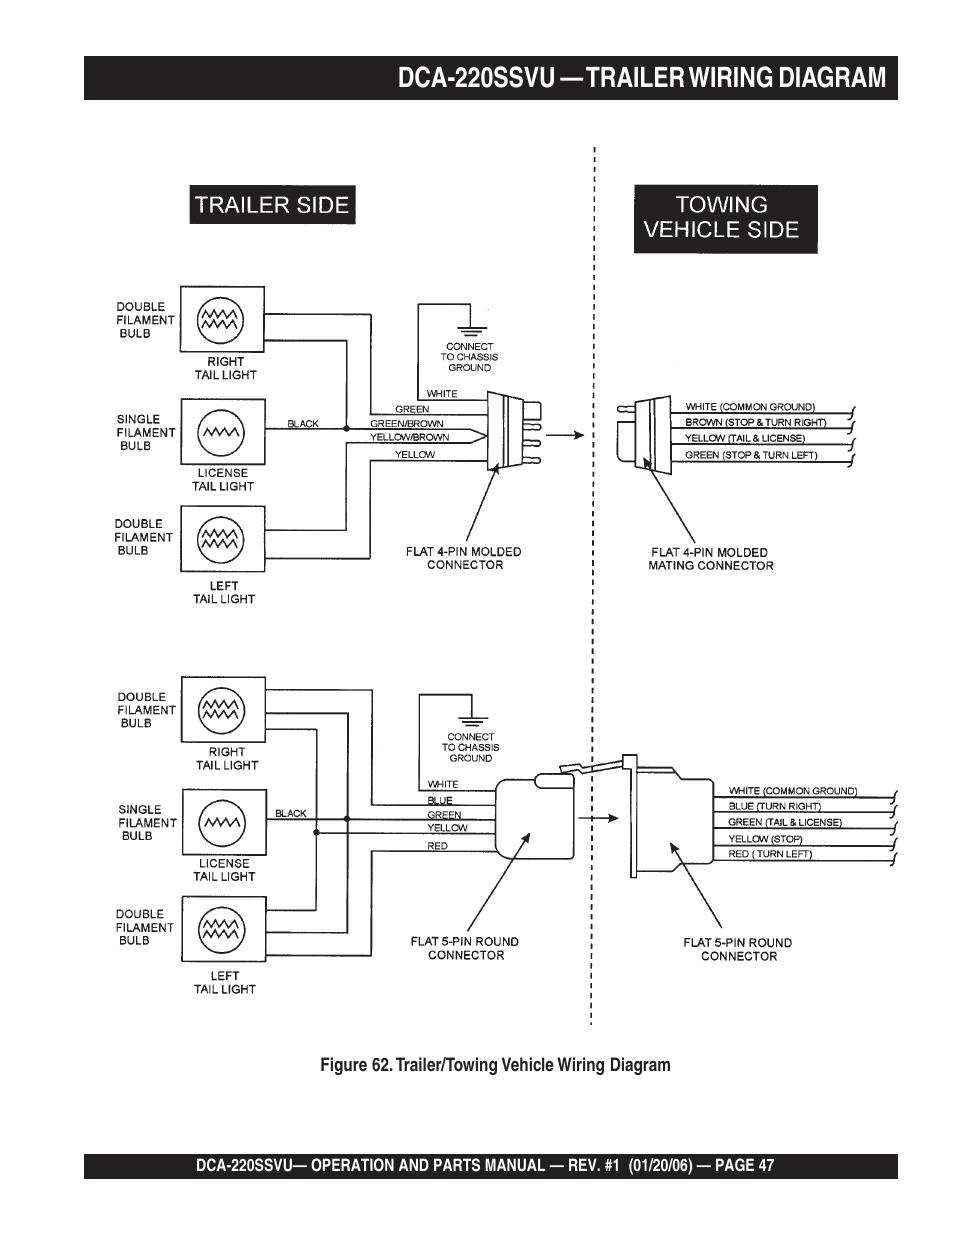 medium resolution of 1dca 220ssvu trailer wiring diagram multiquip mq power whisperwatt 60 hz generator dca